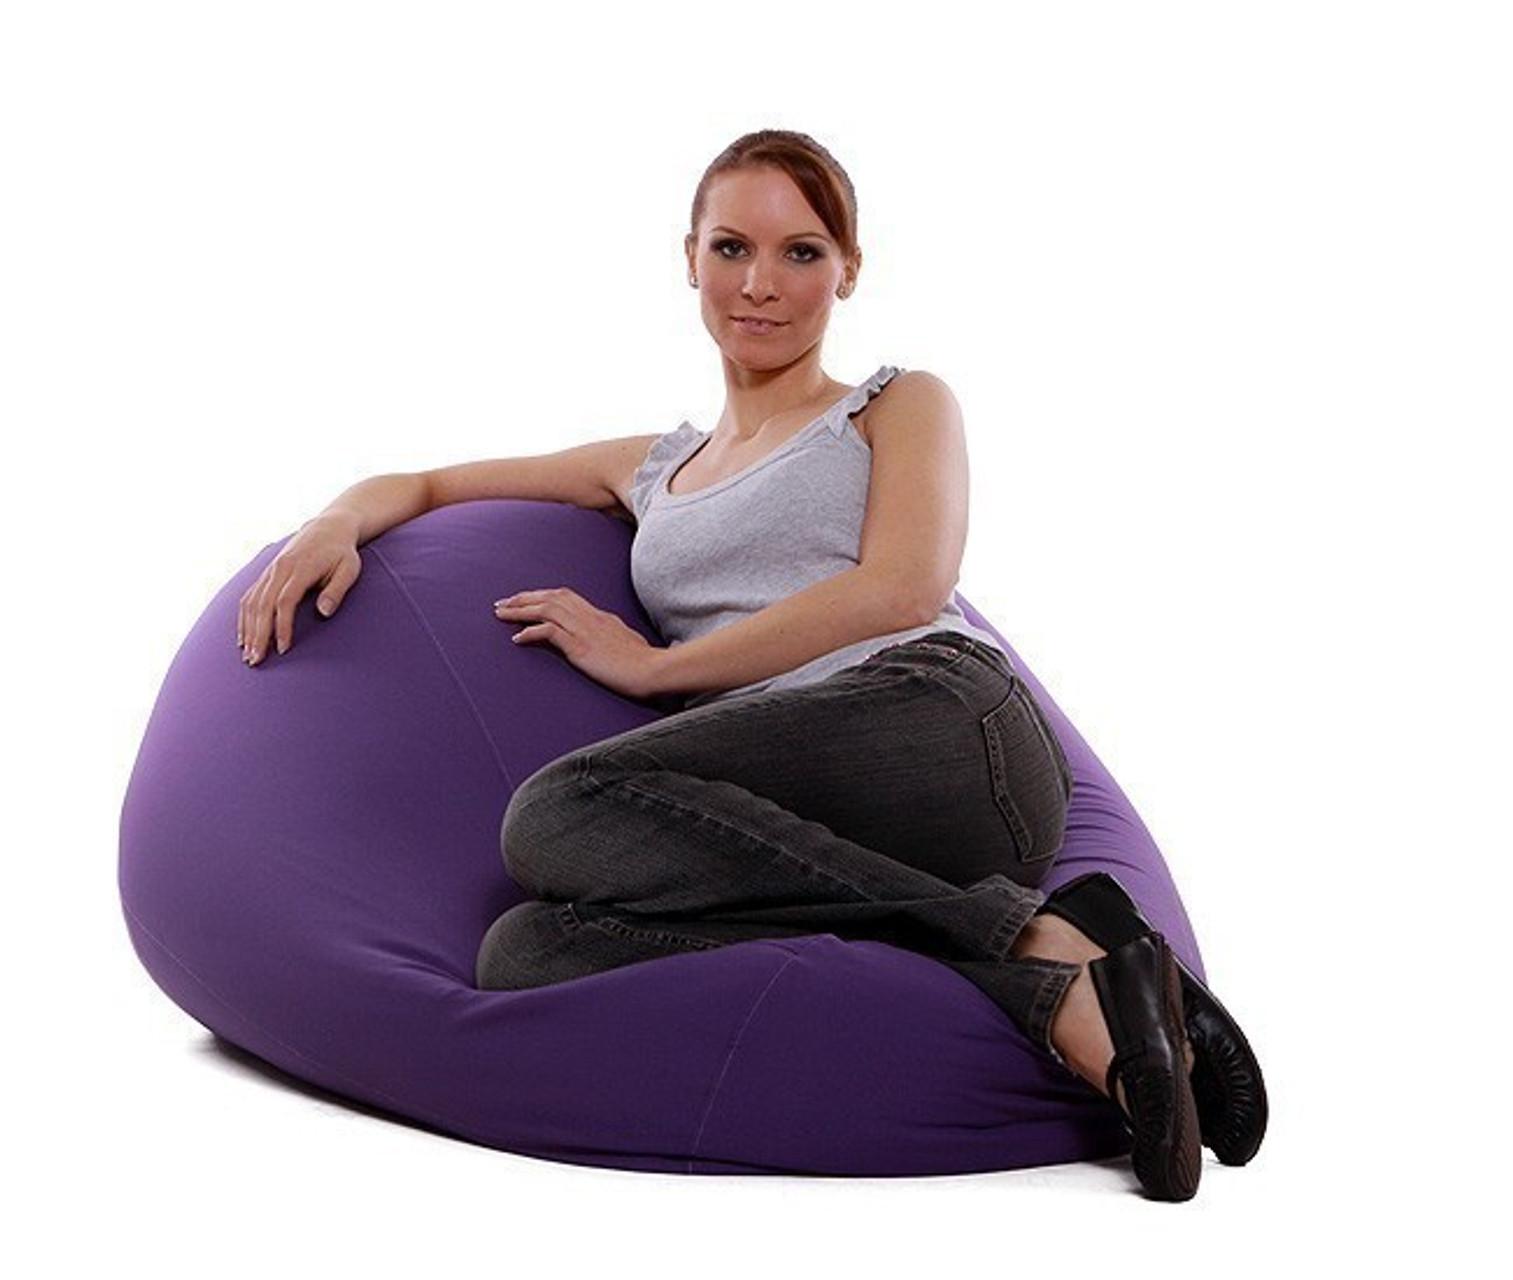 re bax maxi l sitzsack mit leder bezug tribe gr e ca 128 cm durchmesser ca 80 cm. Black Bedroom Furniture Sets. Home Design Ideas